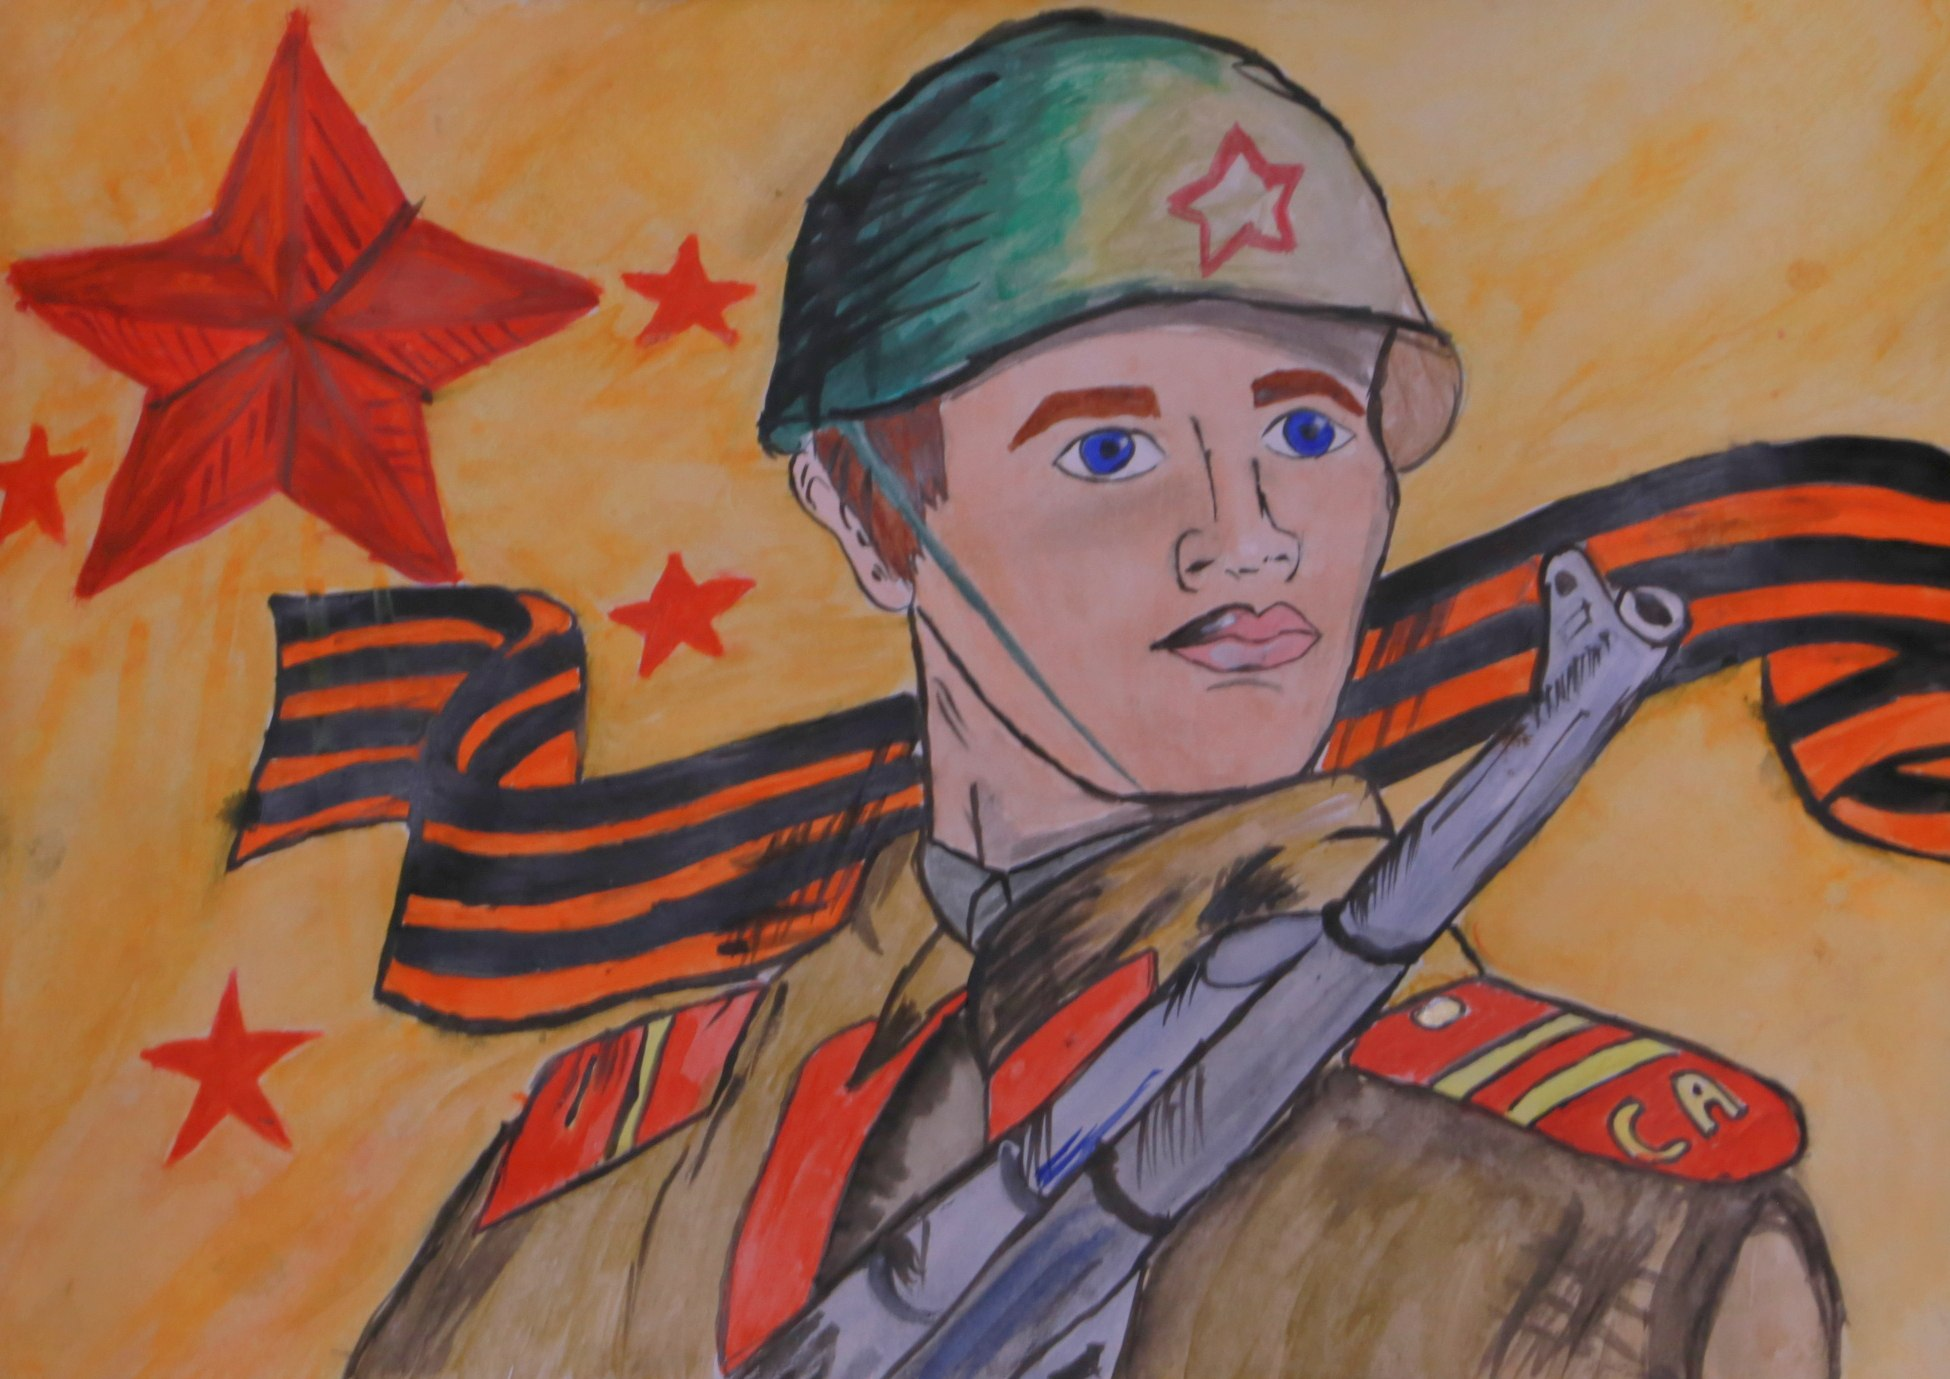 ❶Конкурс защитники отечества|Песня защитники отечества|Сауна ТРК